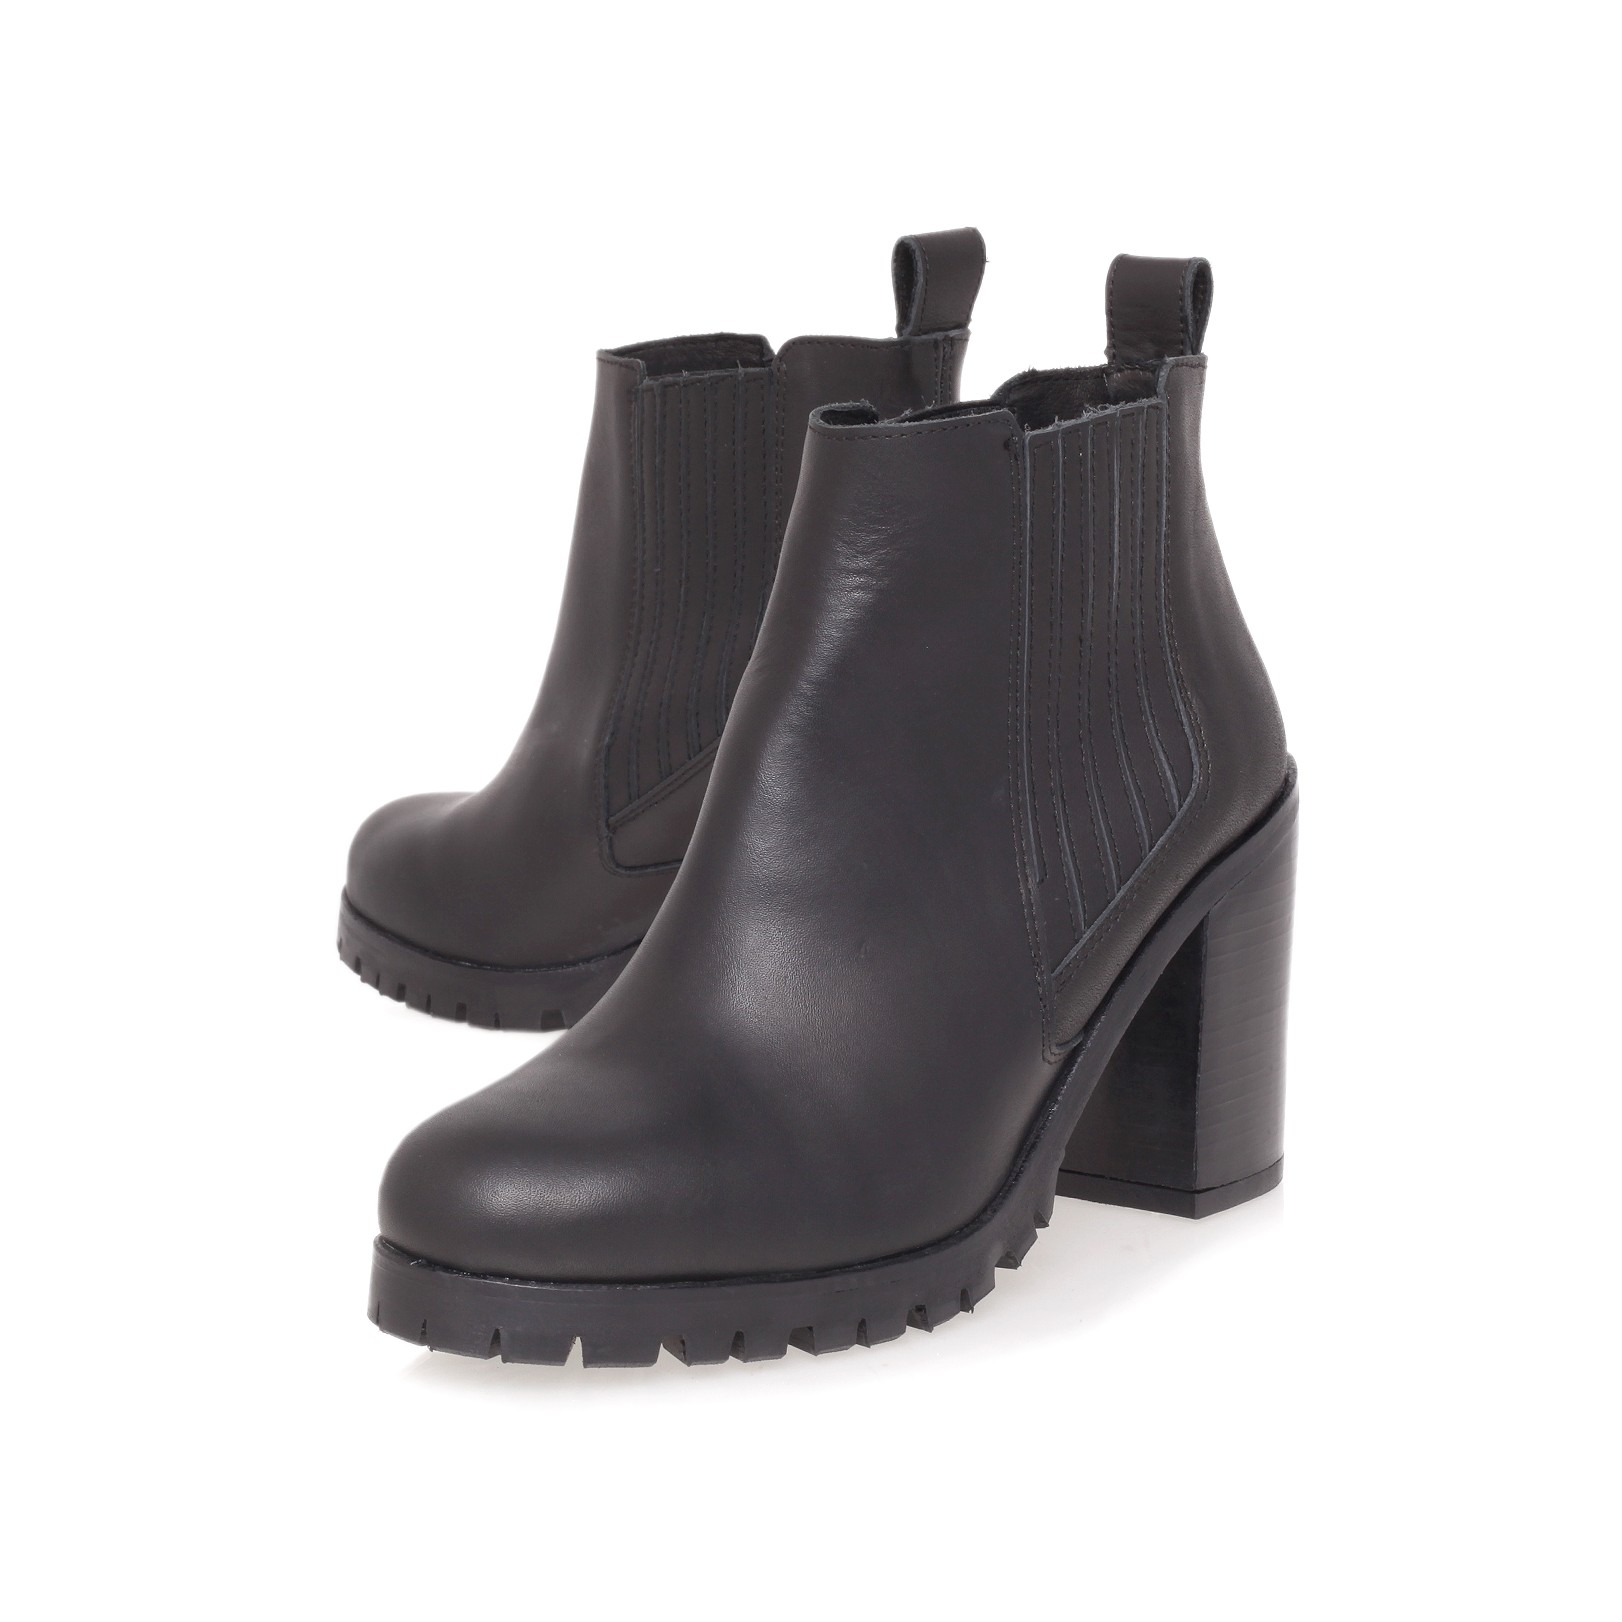 Heel Ankle Boots by KG Kurt Geiger